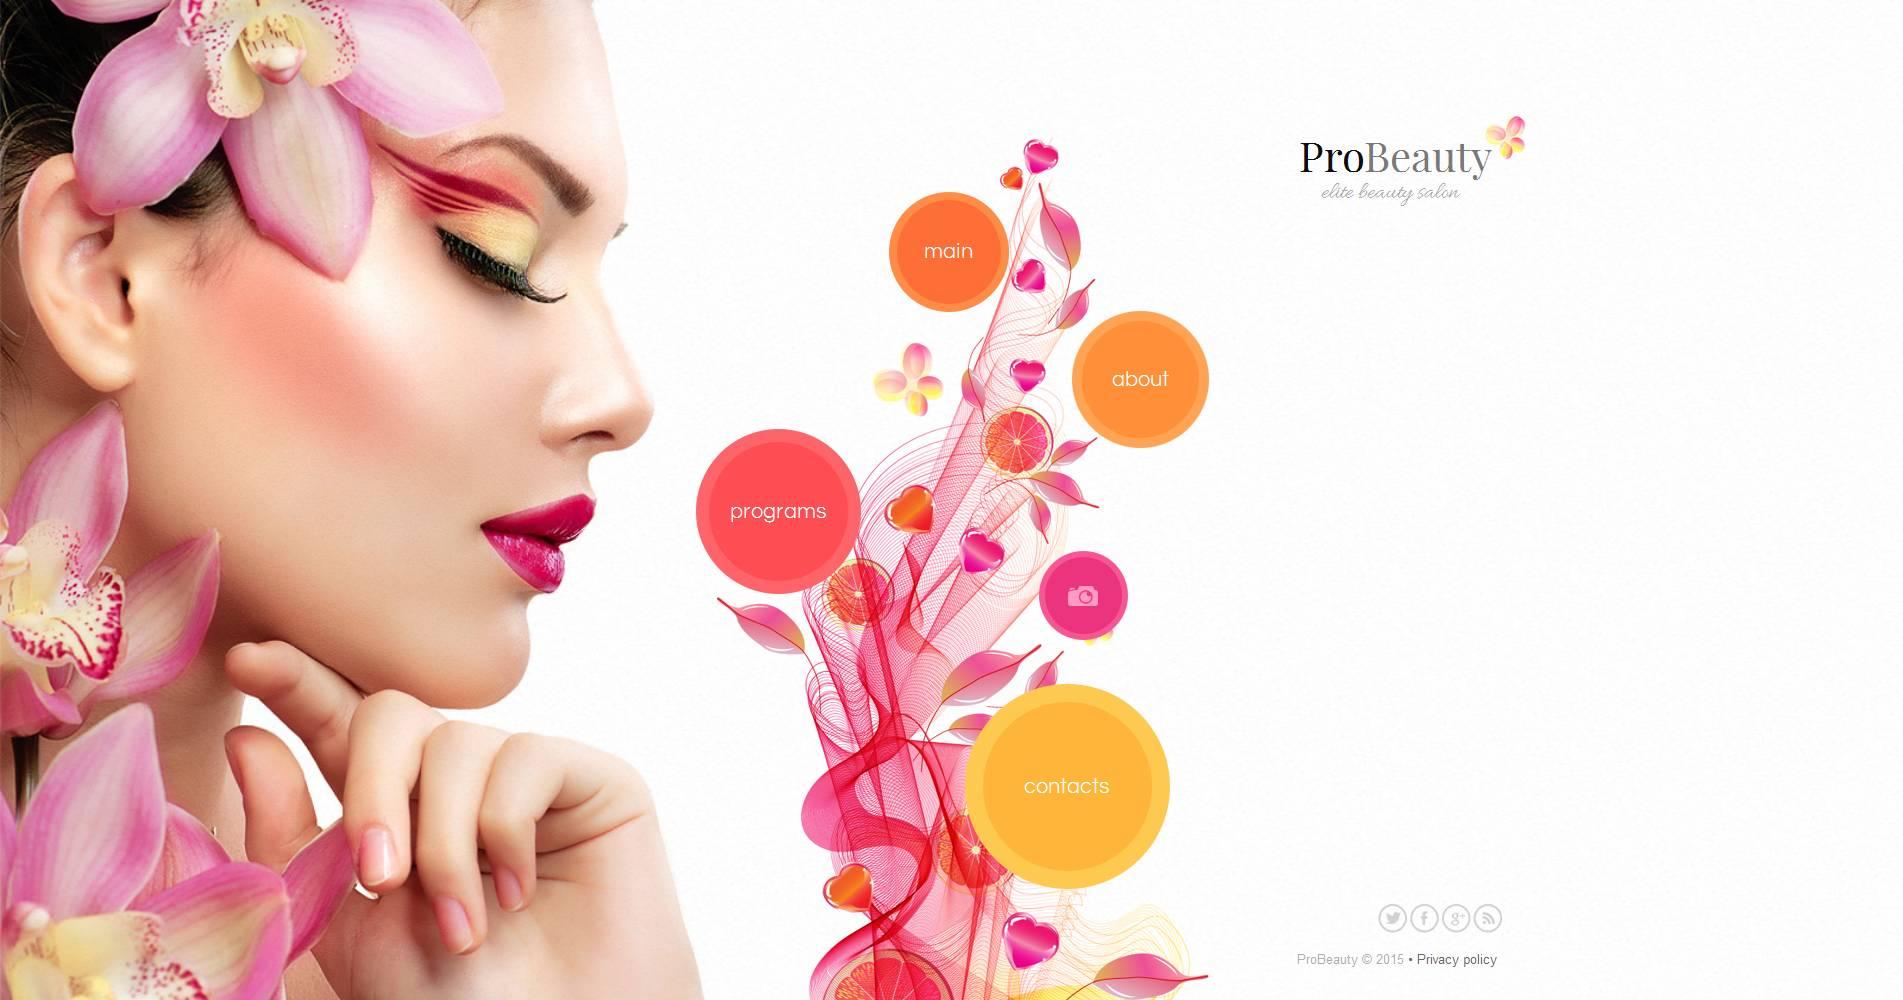 Plantilla Moto CMS HTML #47203 para Sitio de Salones de belleza